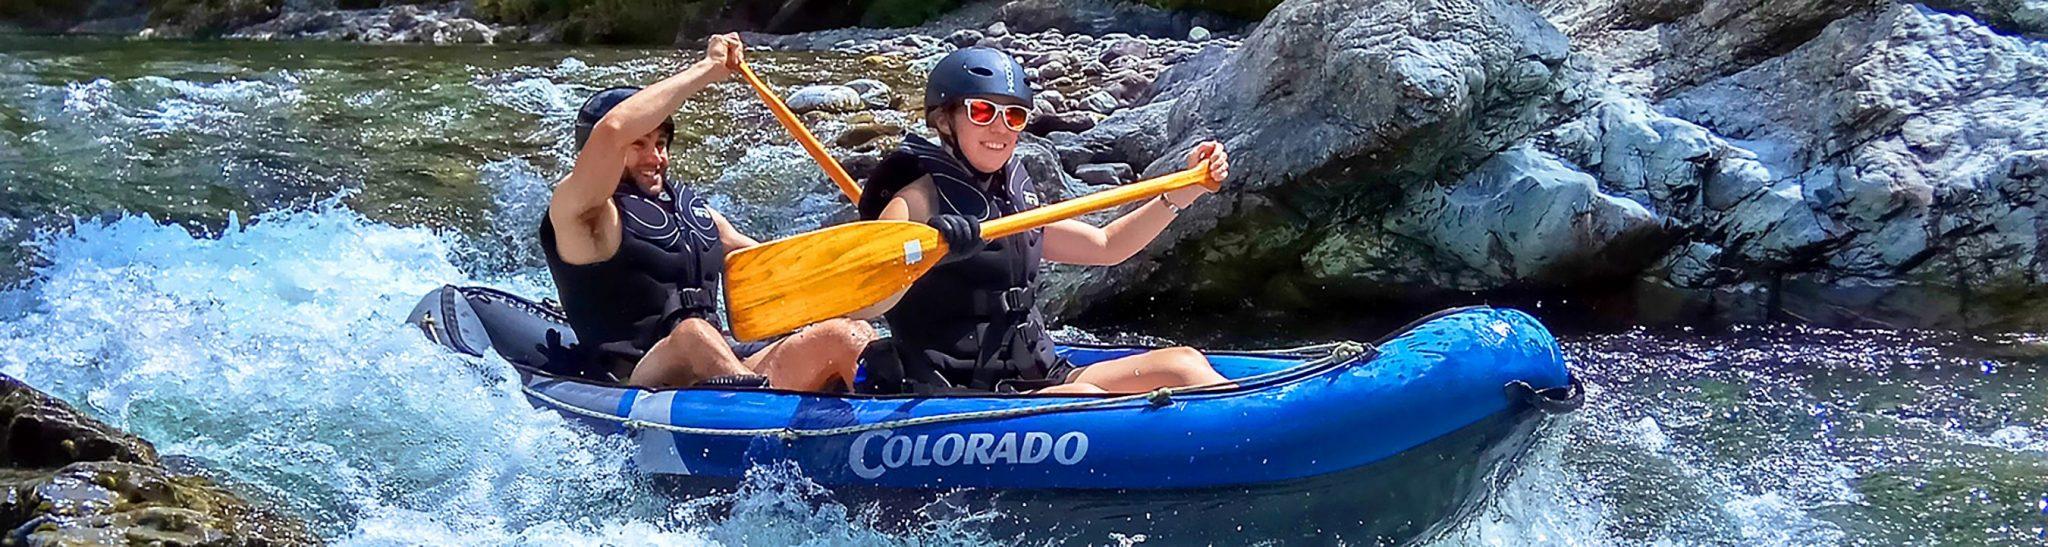 New Zealand Kayaking Blog Header